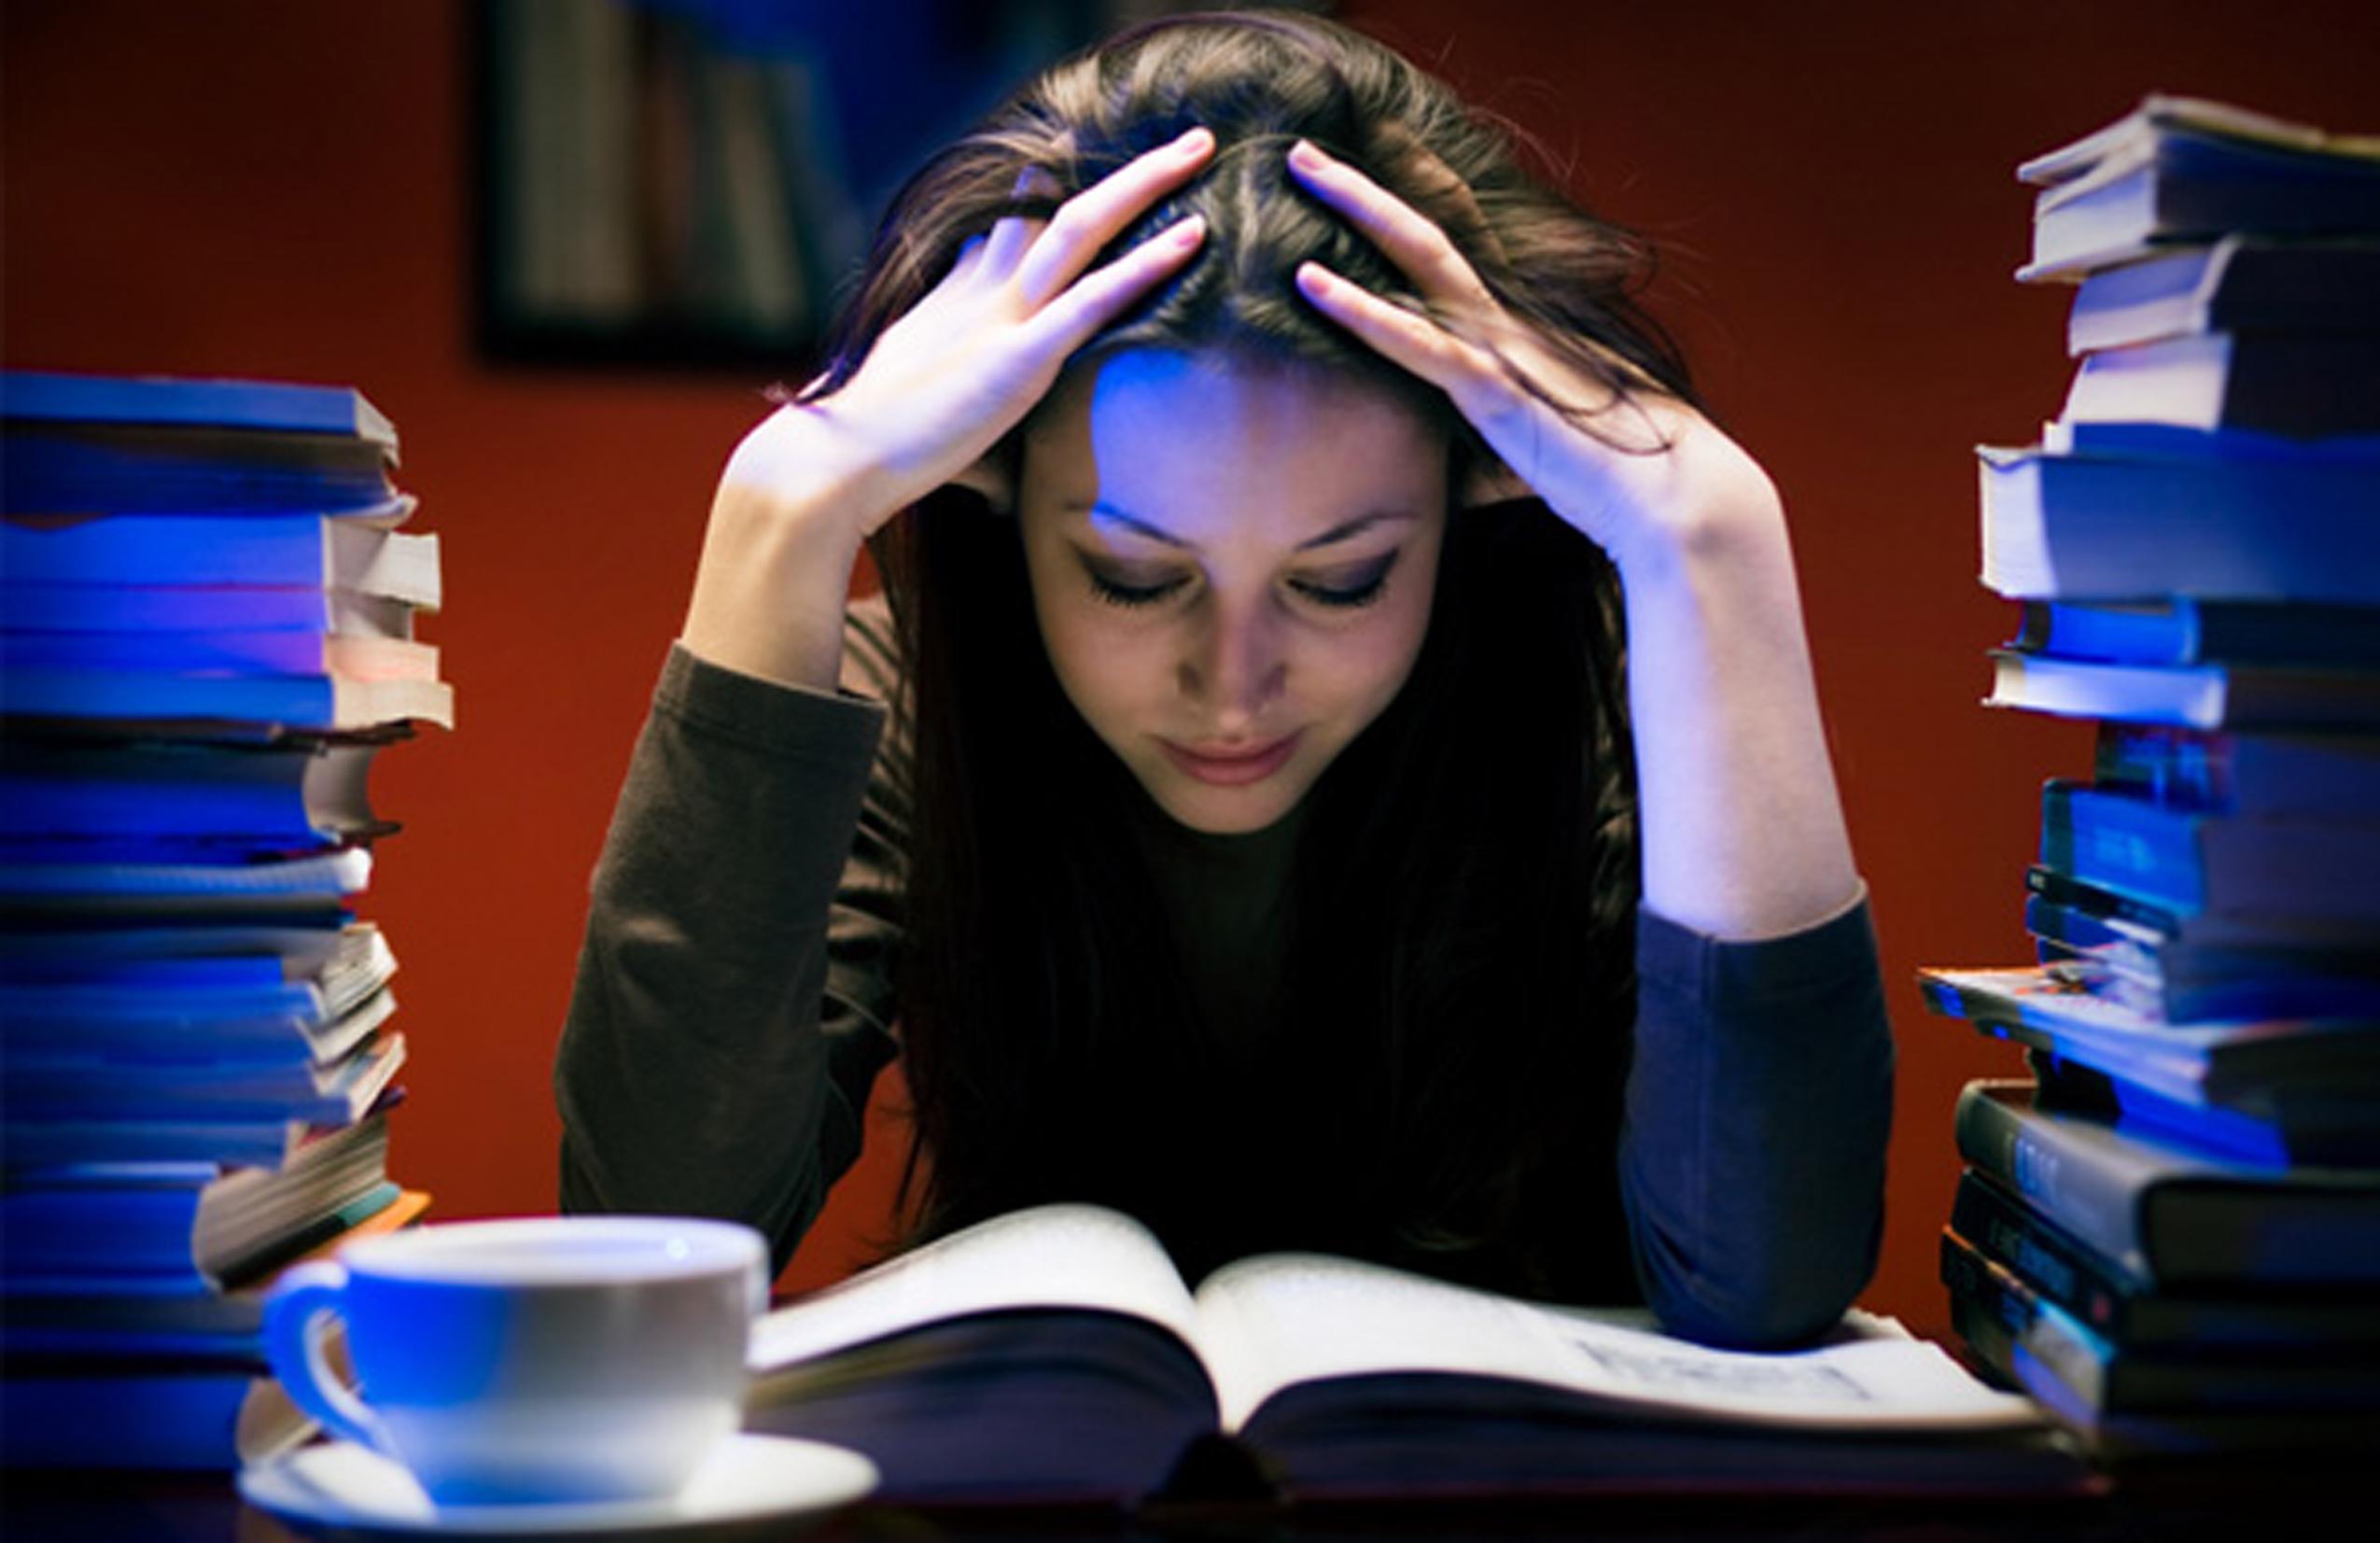 stressed-college-student1.jpg